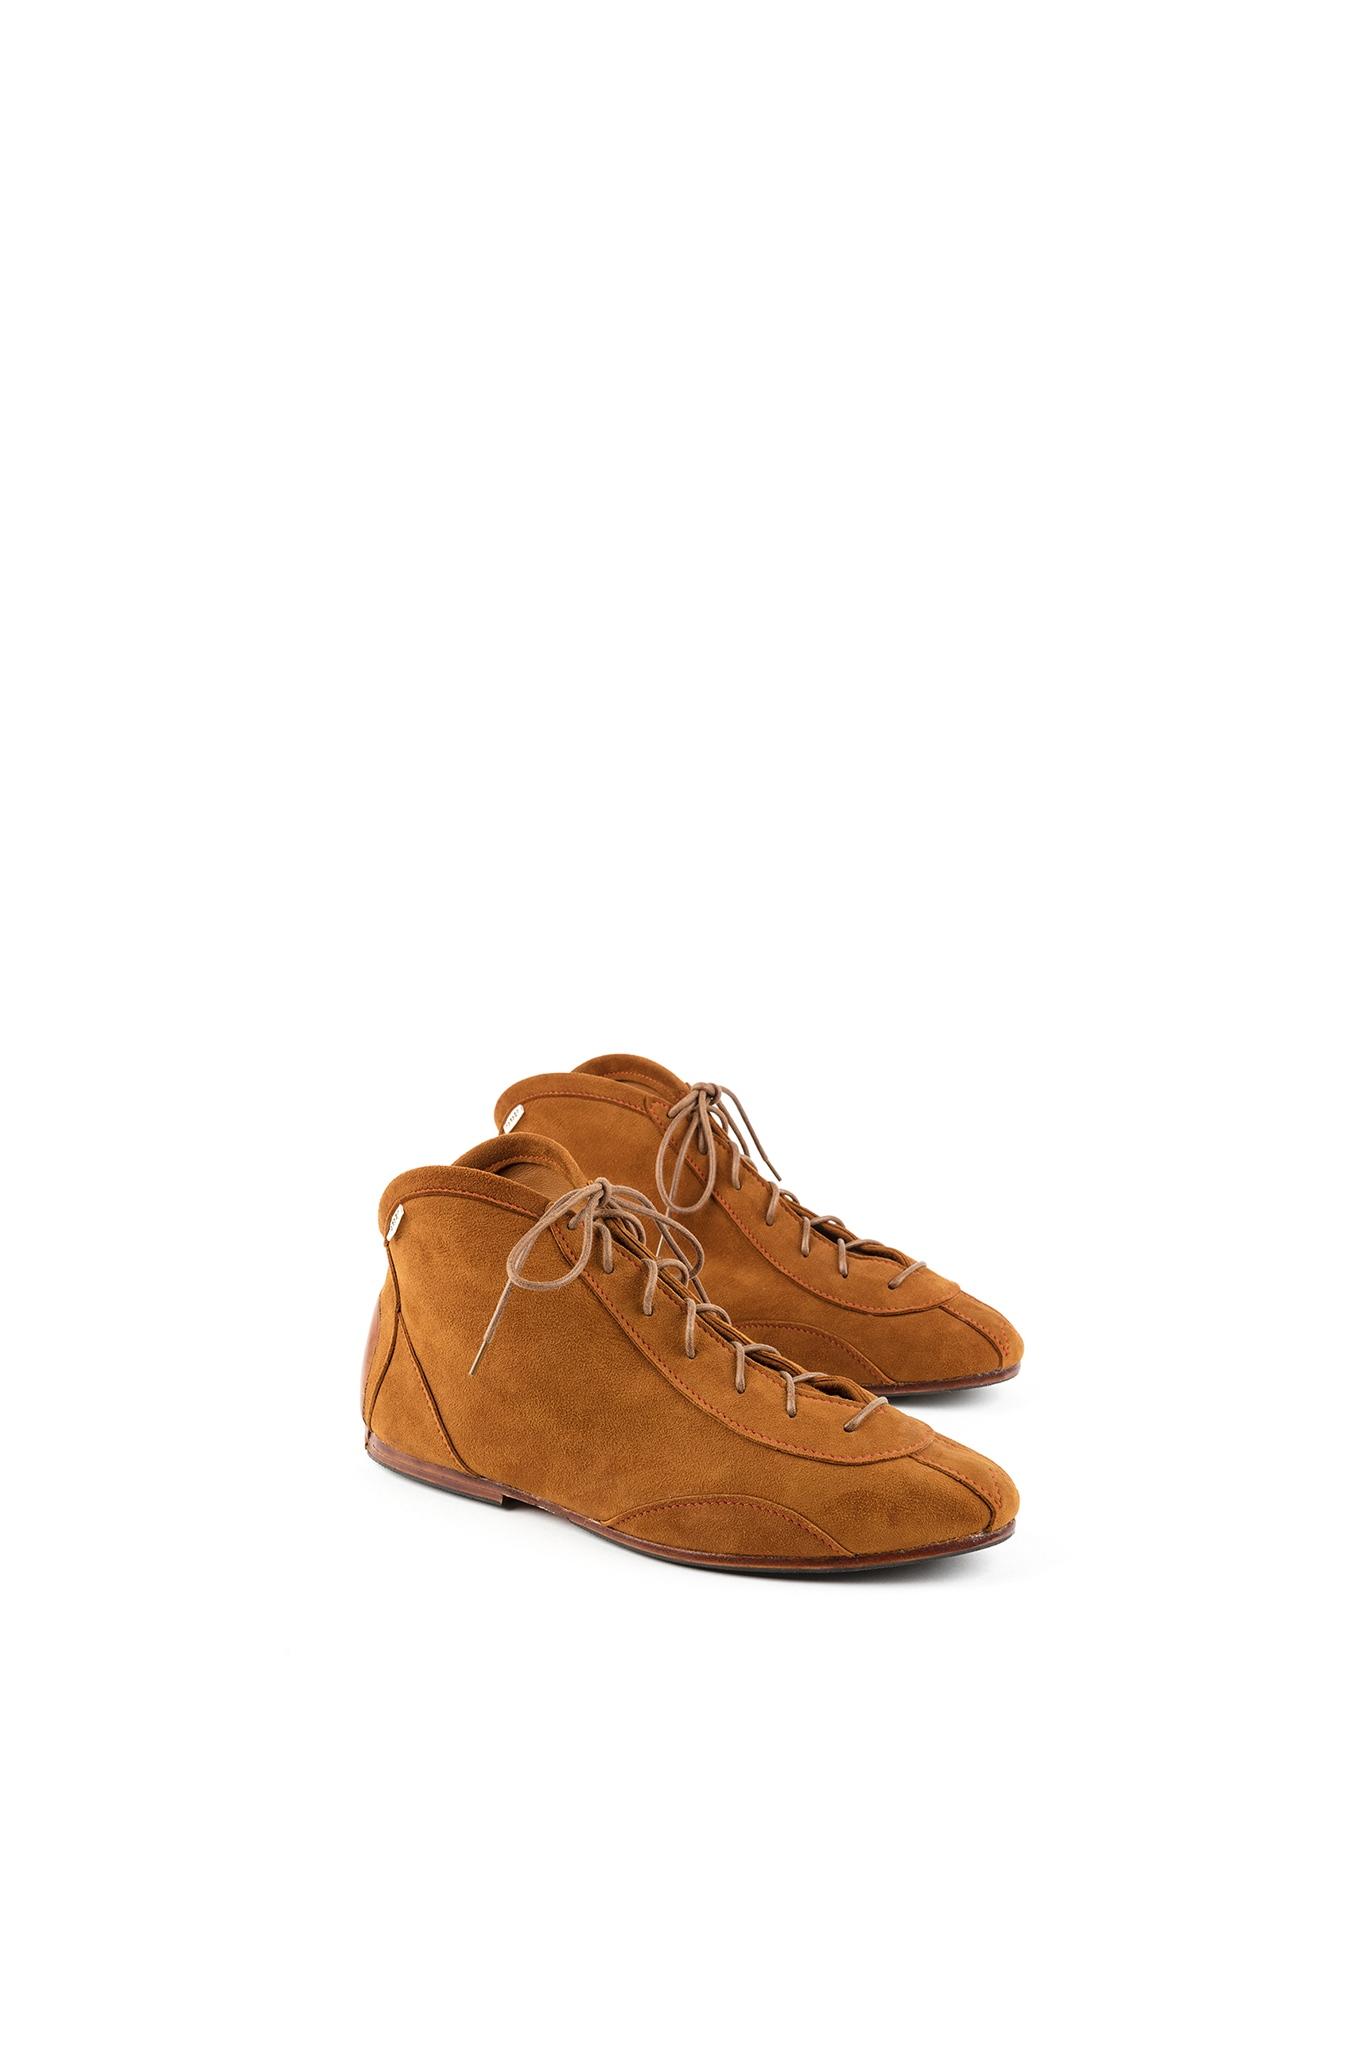 Home page - Pilot 60's Shoes - Suede leather - Suzy color